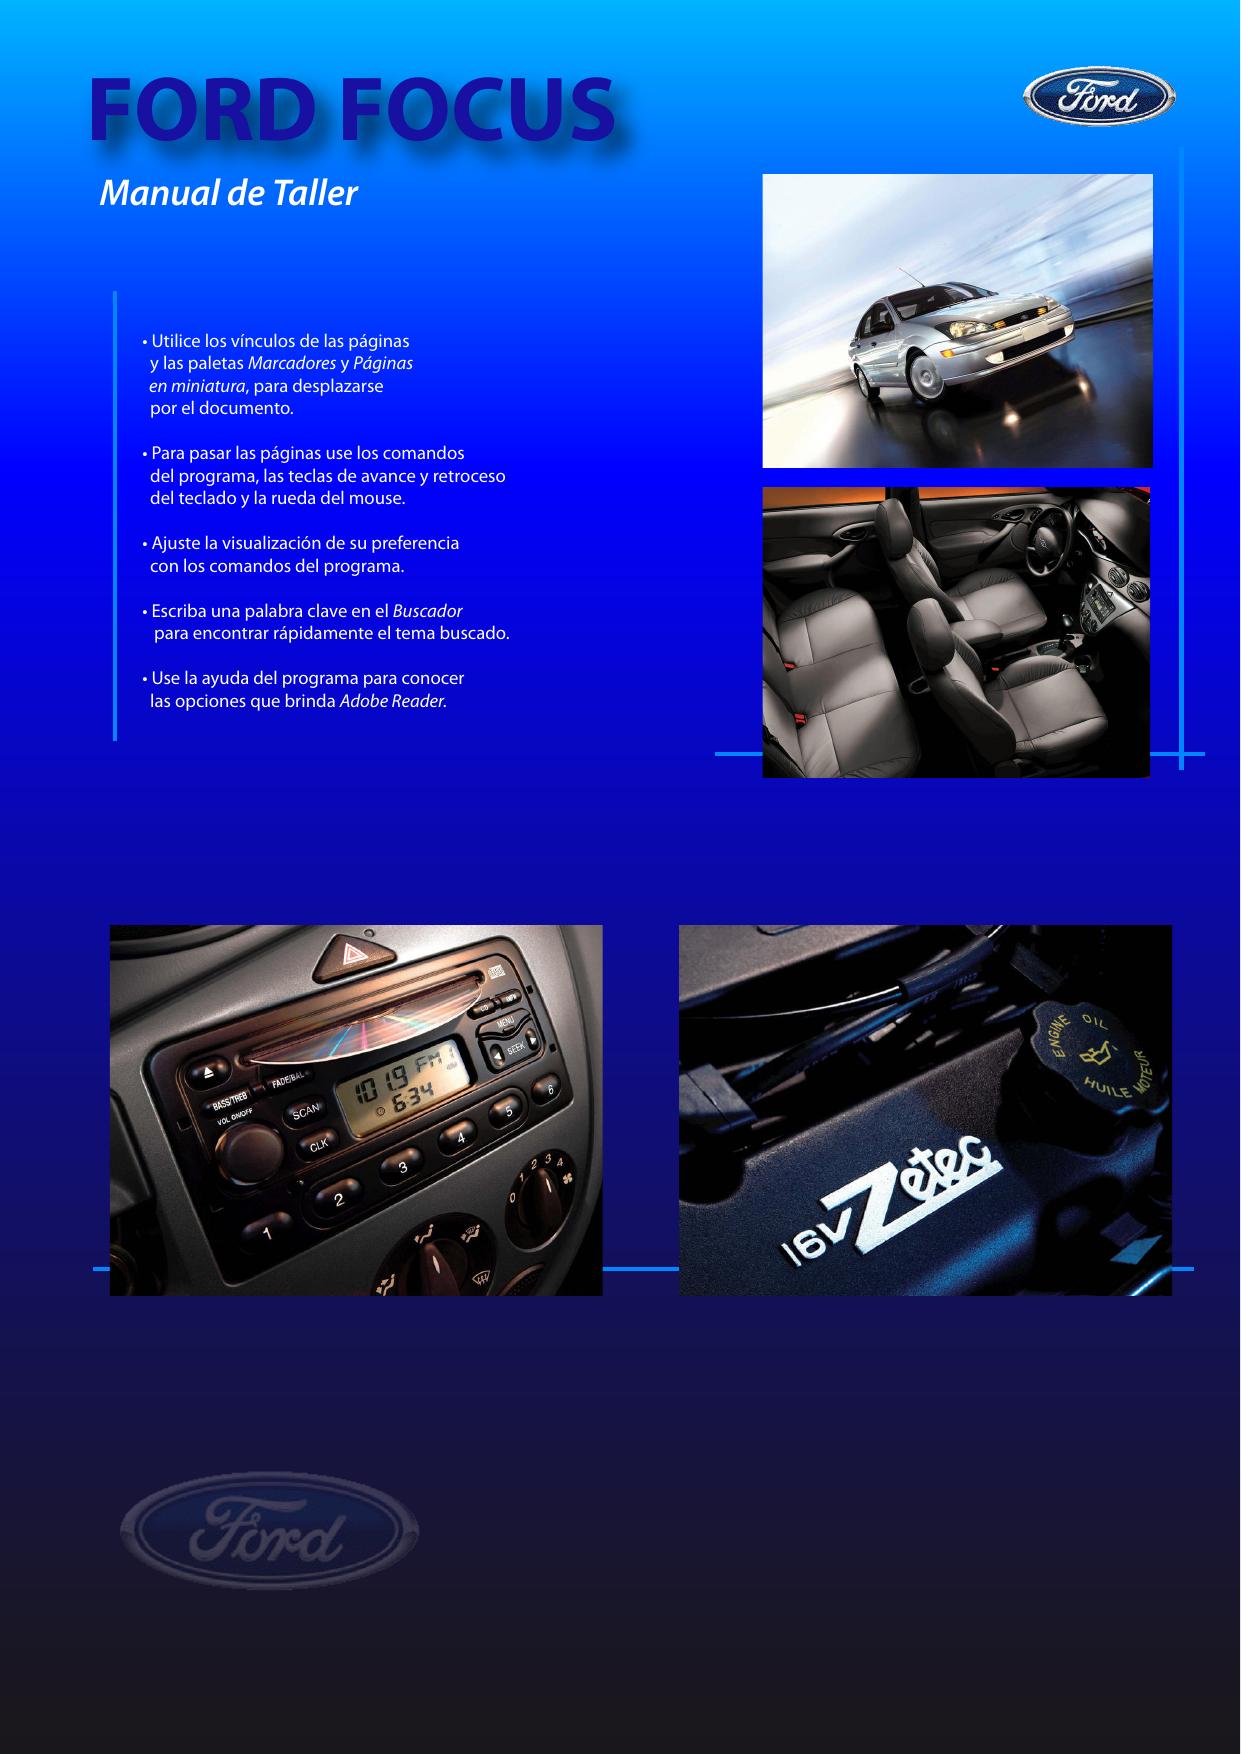 dos bolsillos tirante termina Pista Exterior Inferior Derecho /& Izquierdo Ford Focus C-Max 03